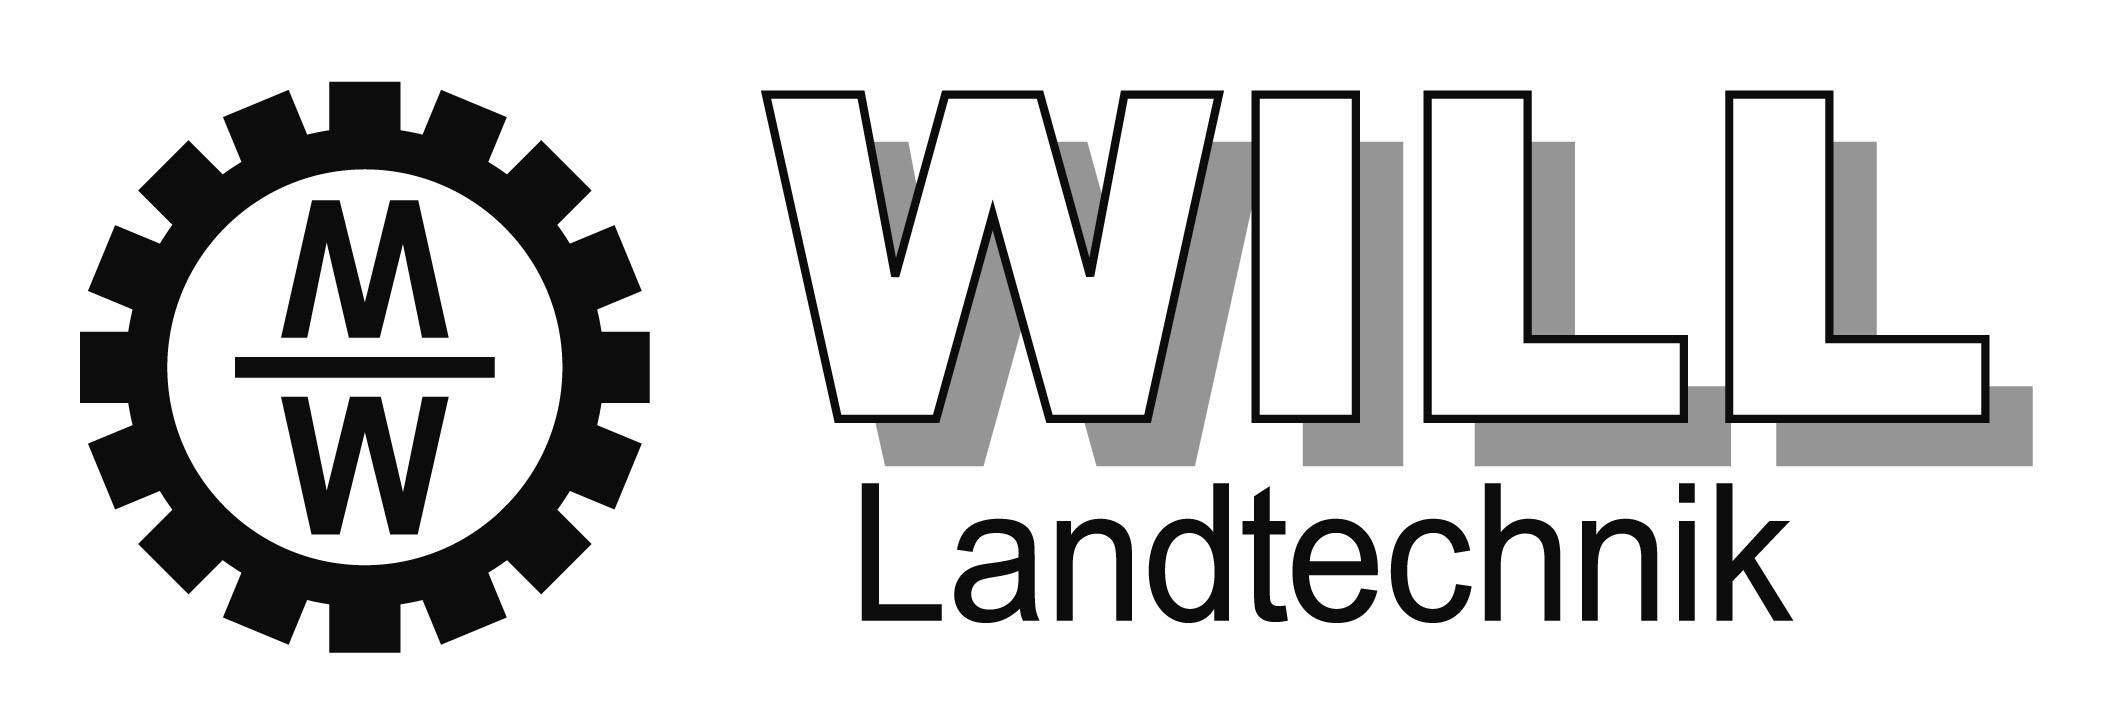 Will Landtechnik GmbH & Co. KG